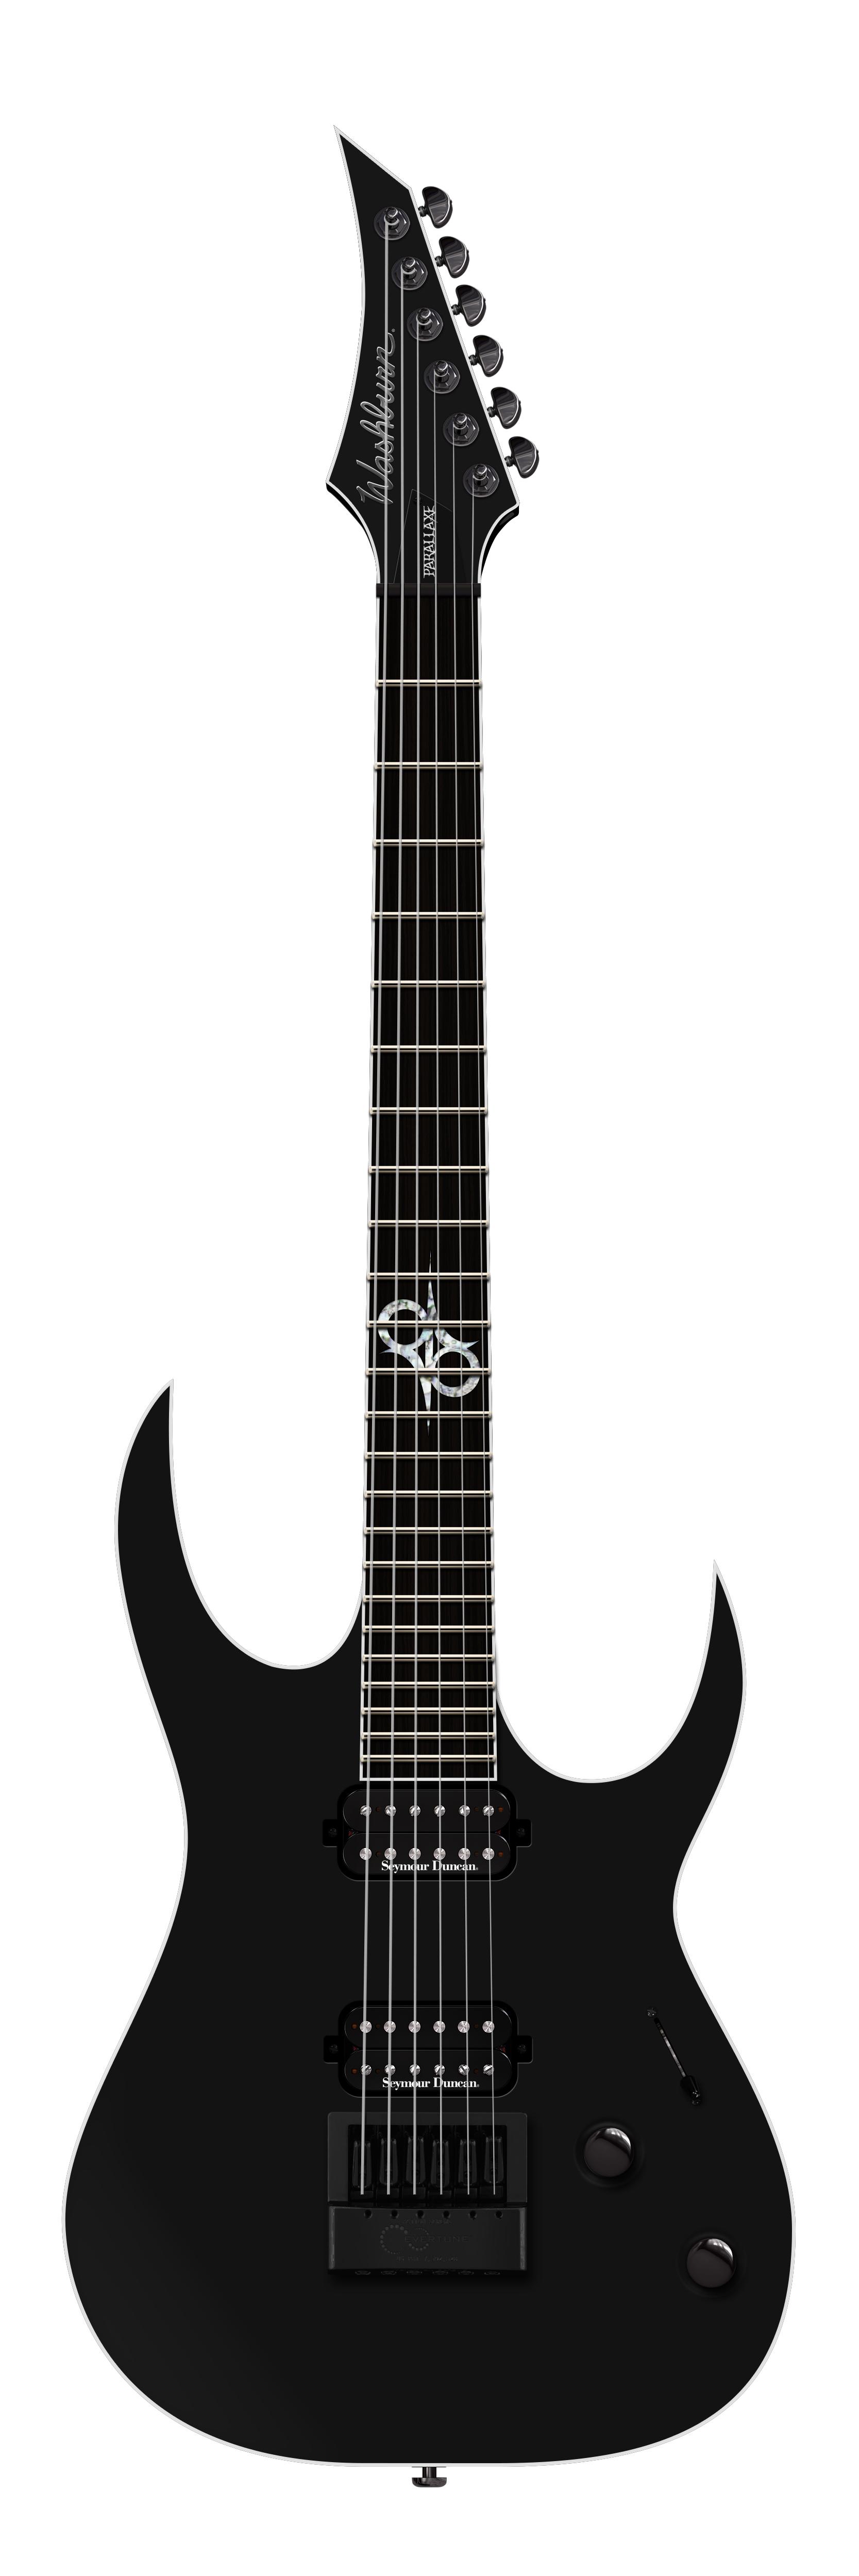 washburn ola englund solar signature series guitars coming soon. Black Bedroom Furniture Sets. Home Design Ideas